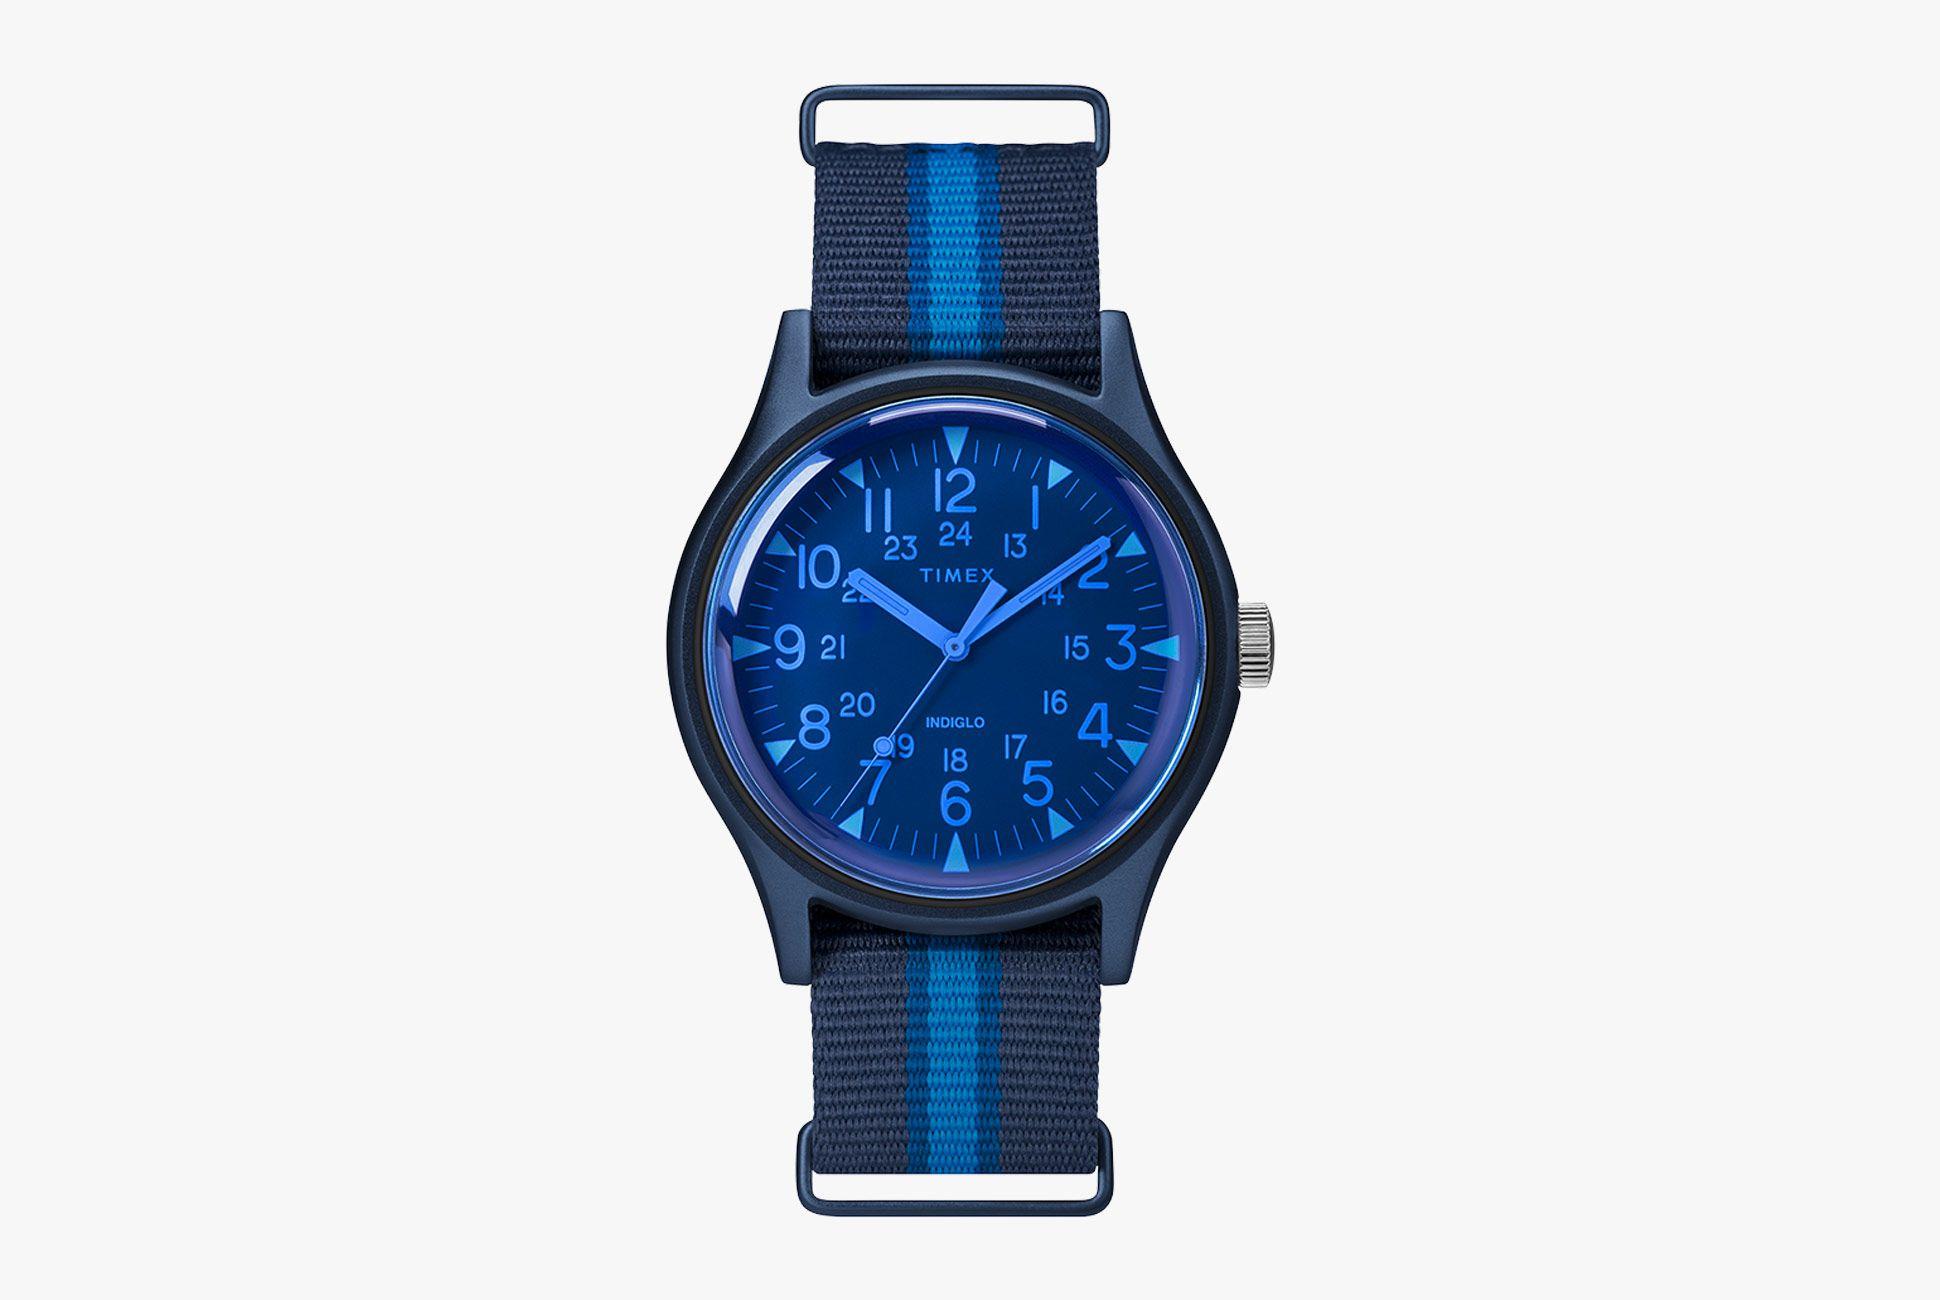 Timex-California-Deal-Gear-Patrol-Slide-5